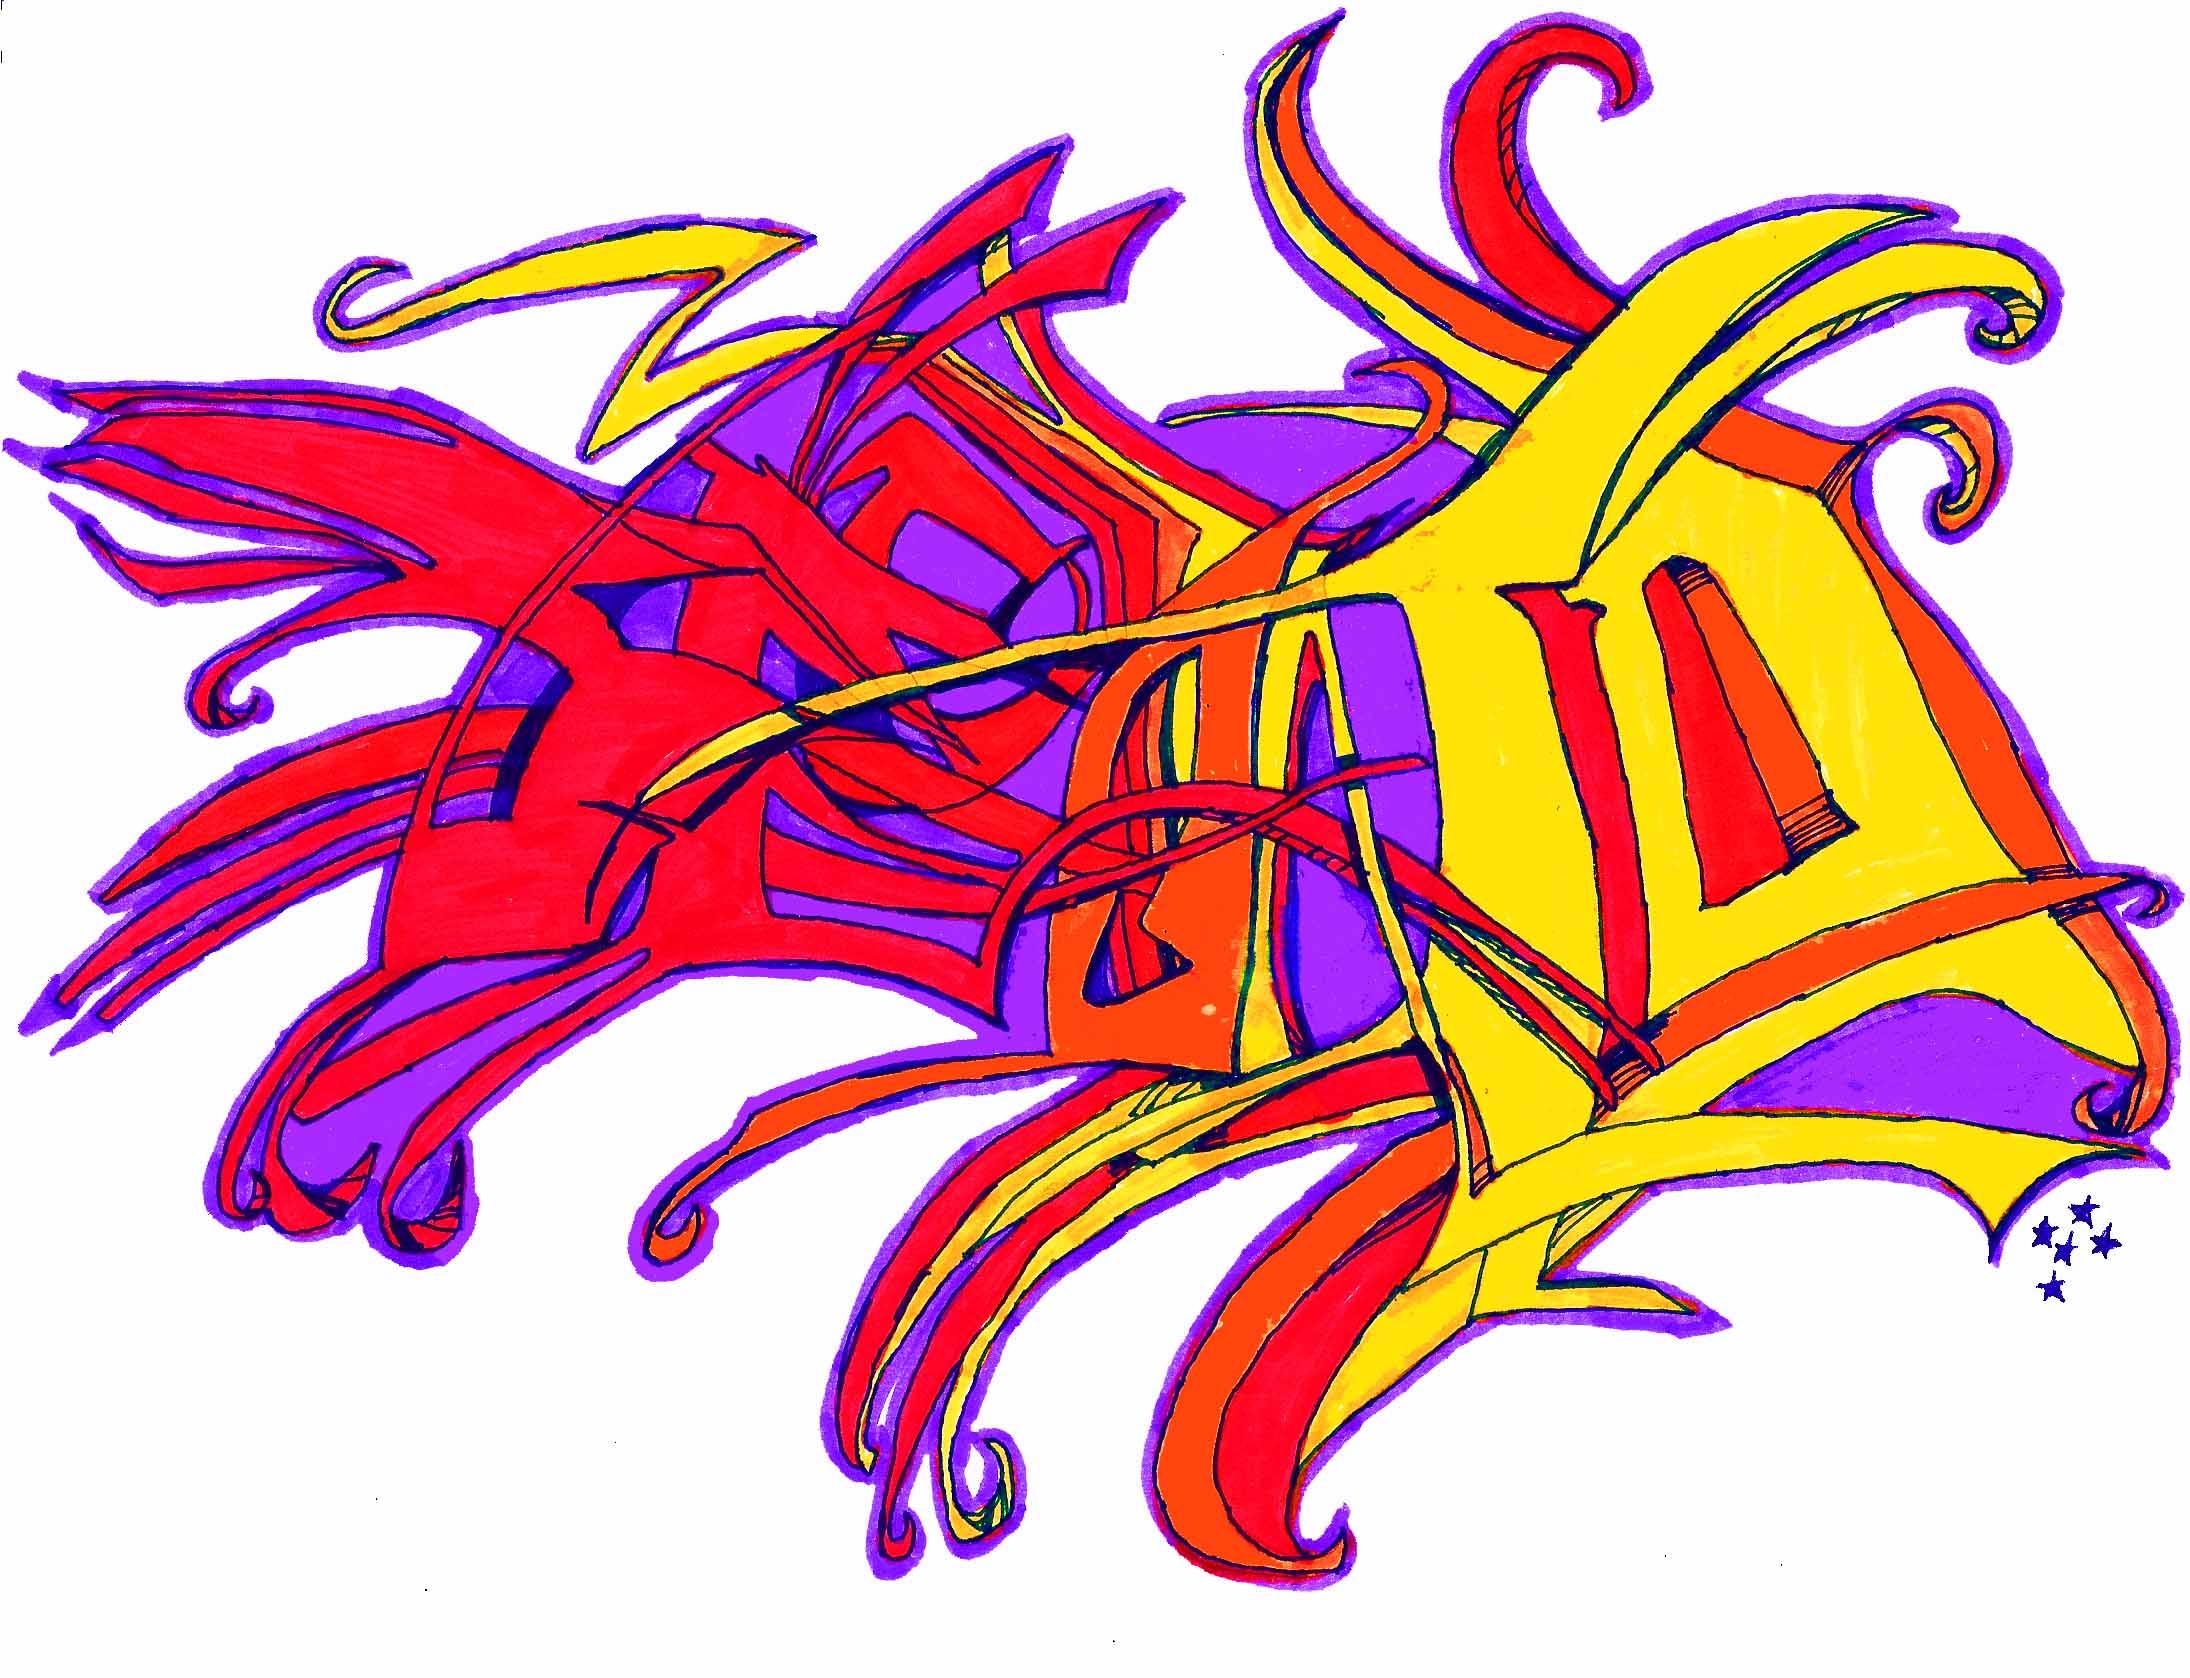 second graffiti